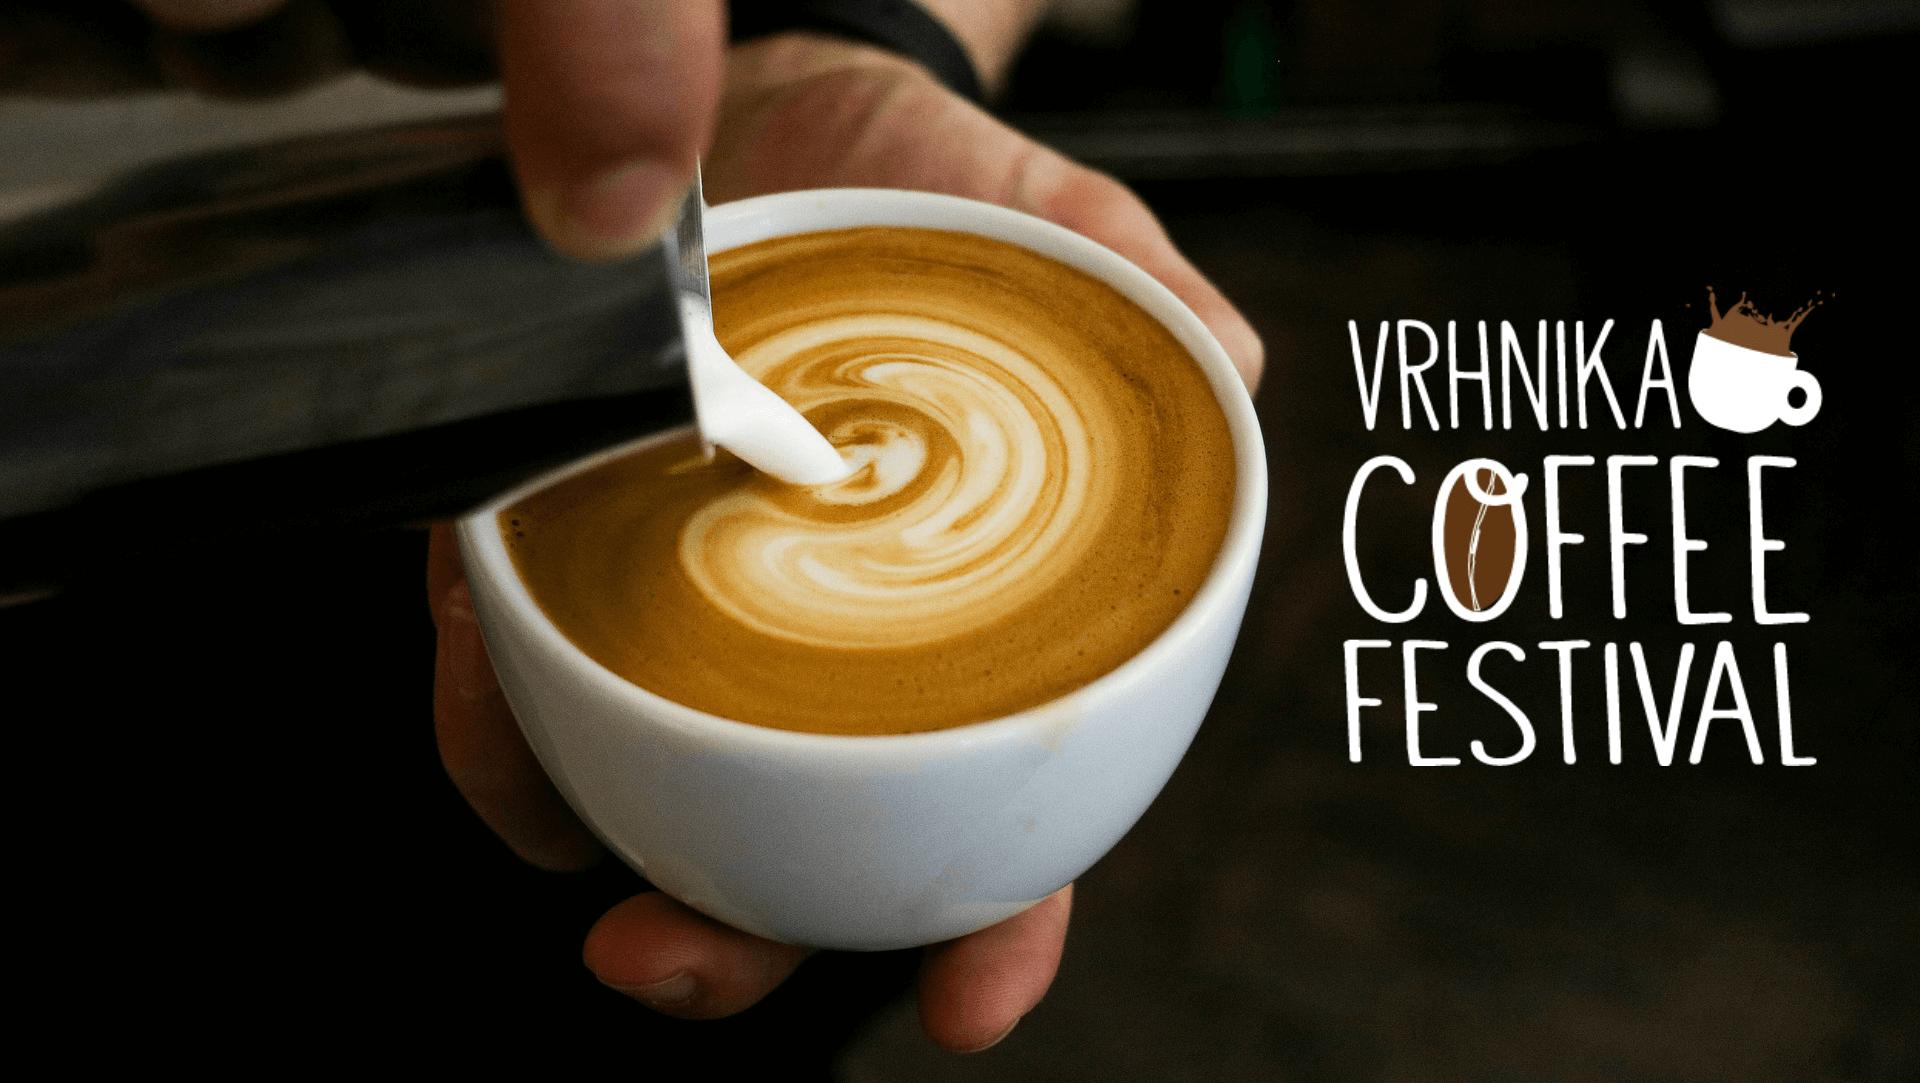 Vrhnika Coffee Festival 2017